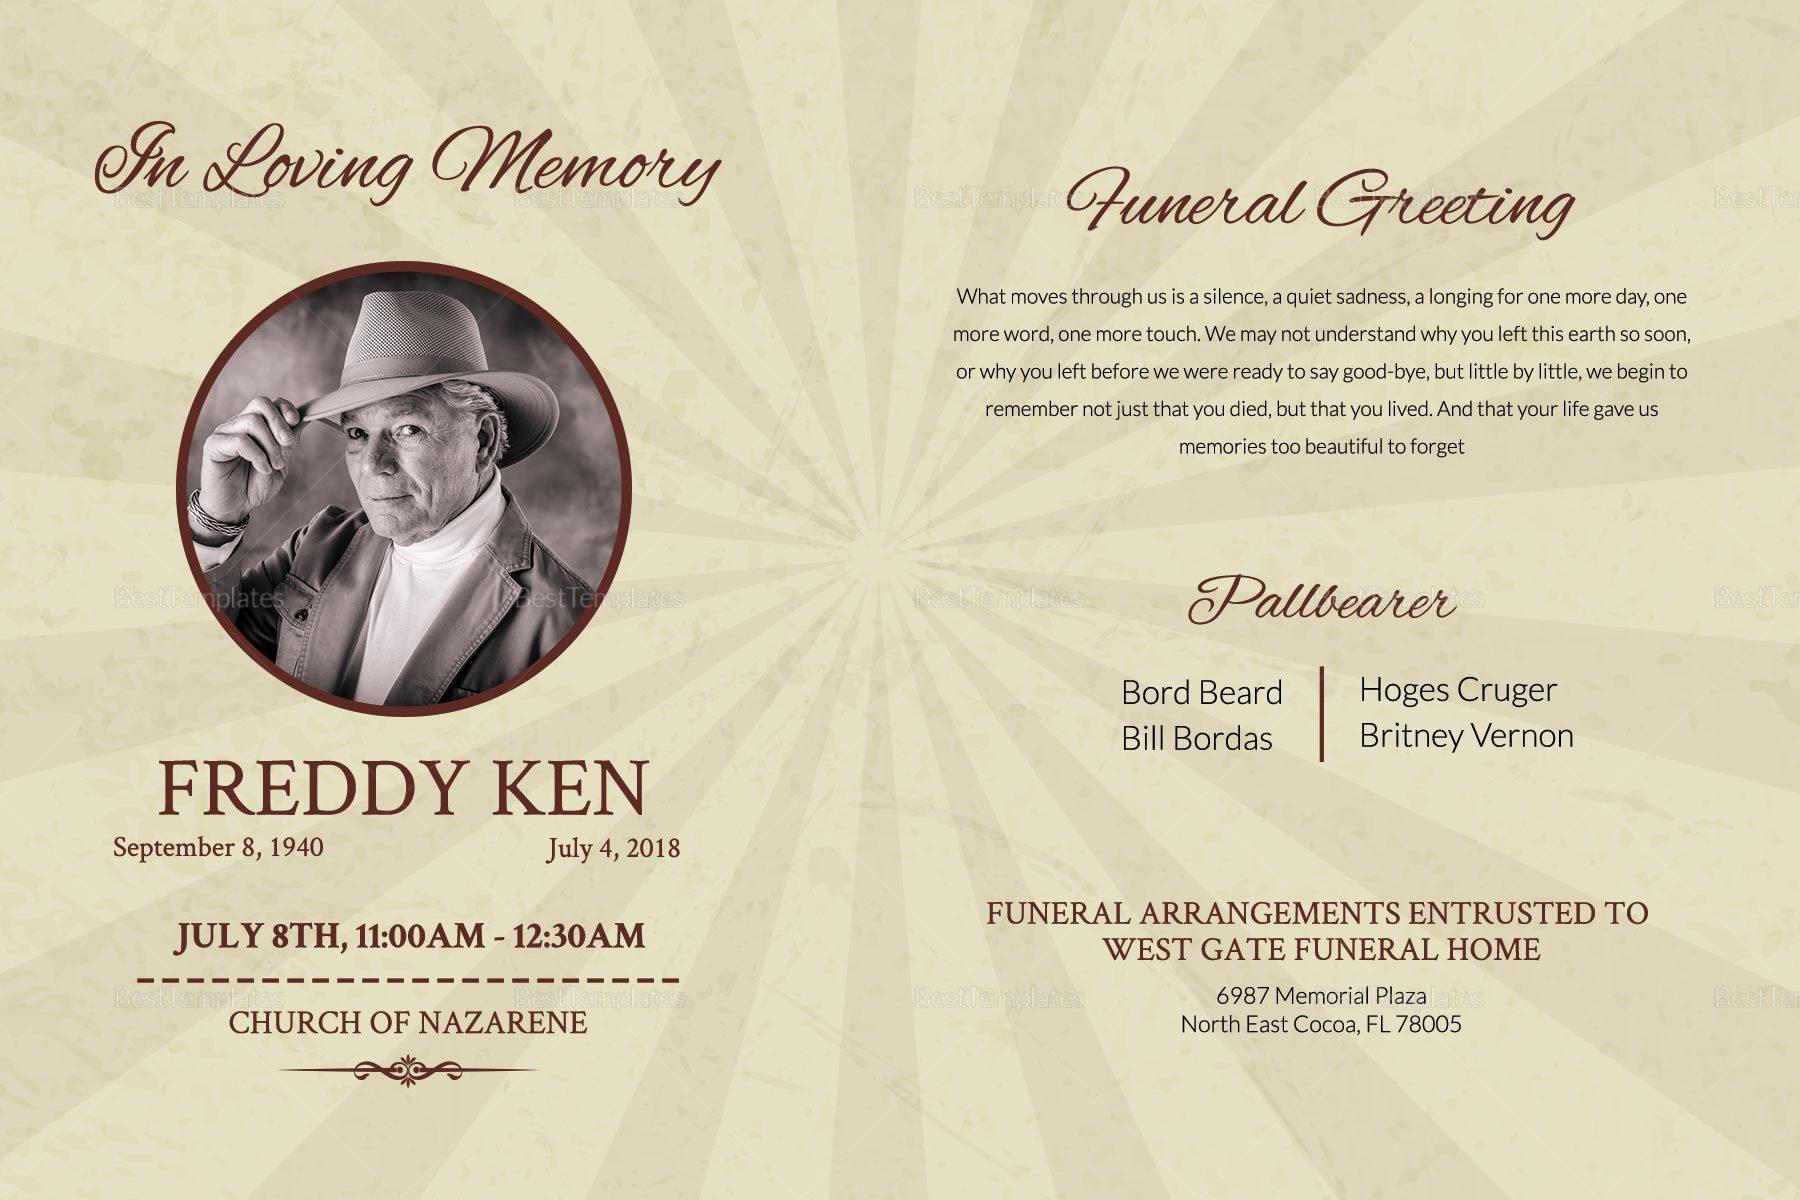 Printable Funeral Greeting Card